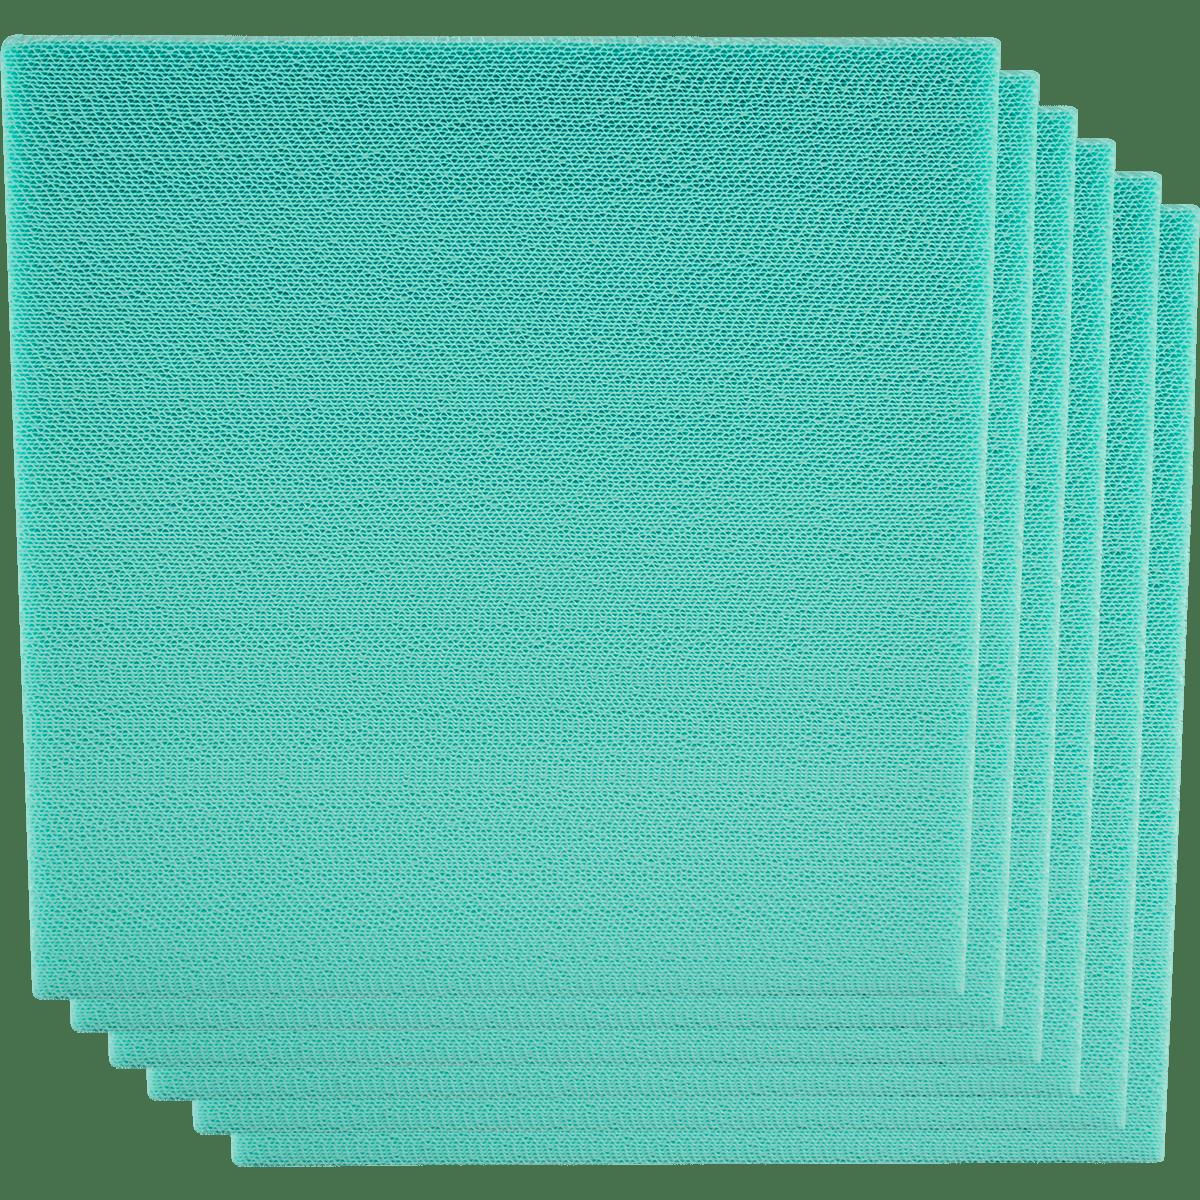 Dri-eaz Drizair 1200 Replacement Haf Filter - 6 Pack (f368)